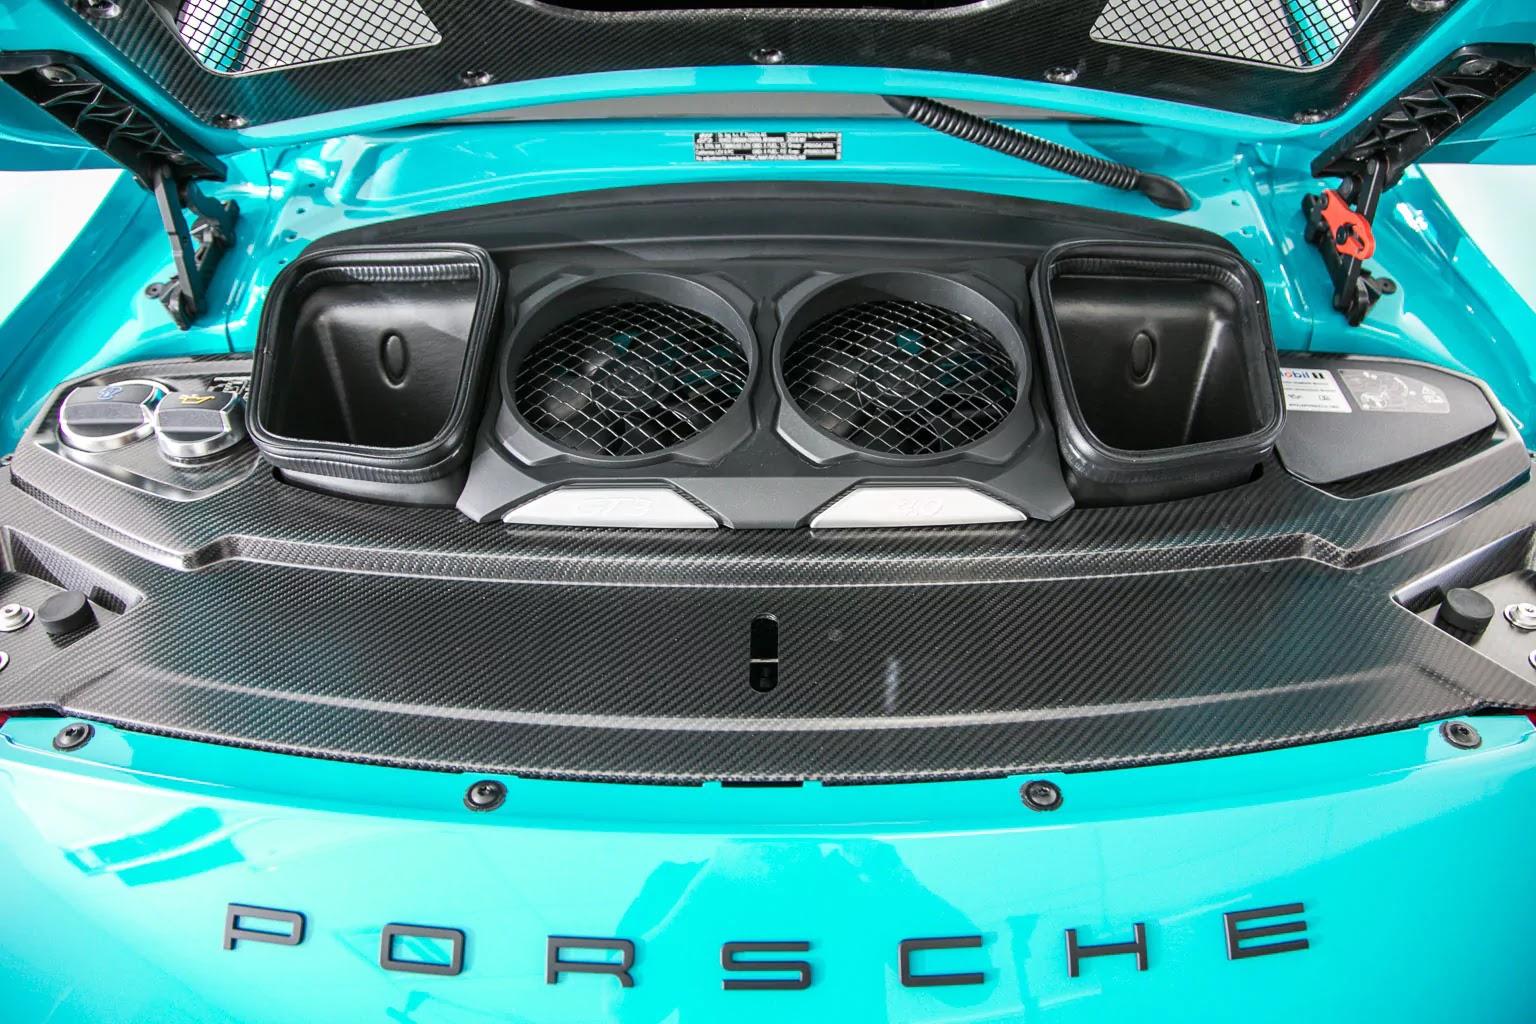 Porsche_911_GT3_Miami_Blue_08